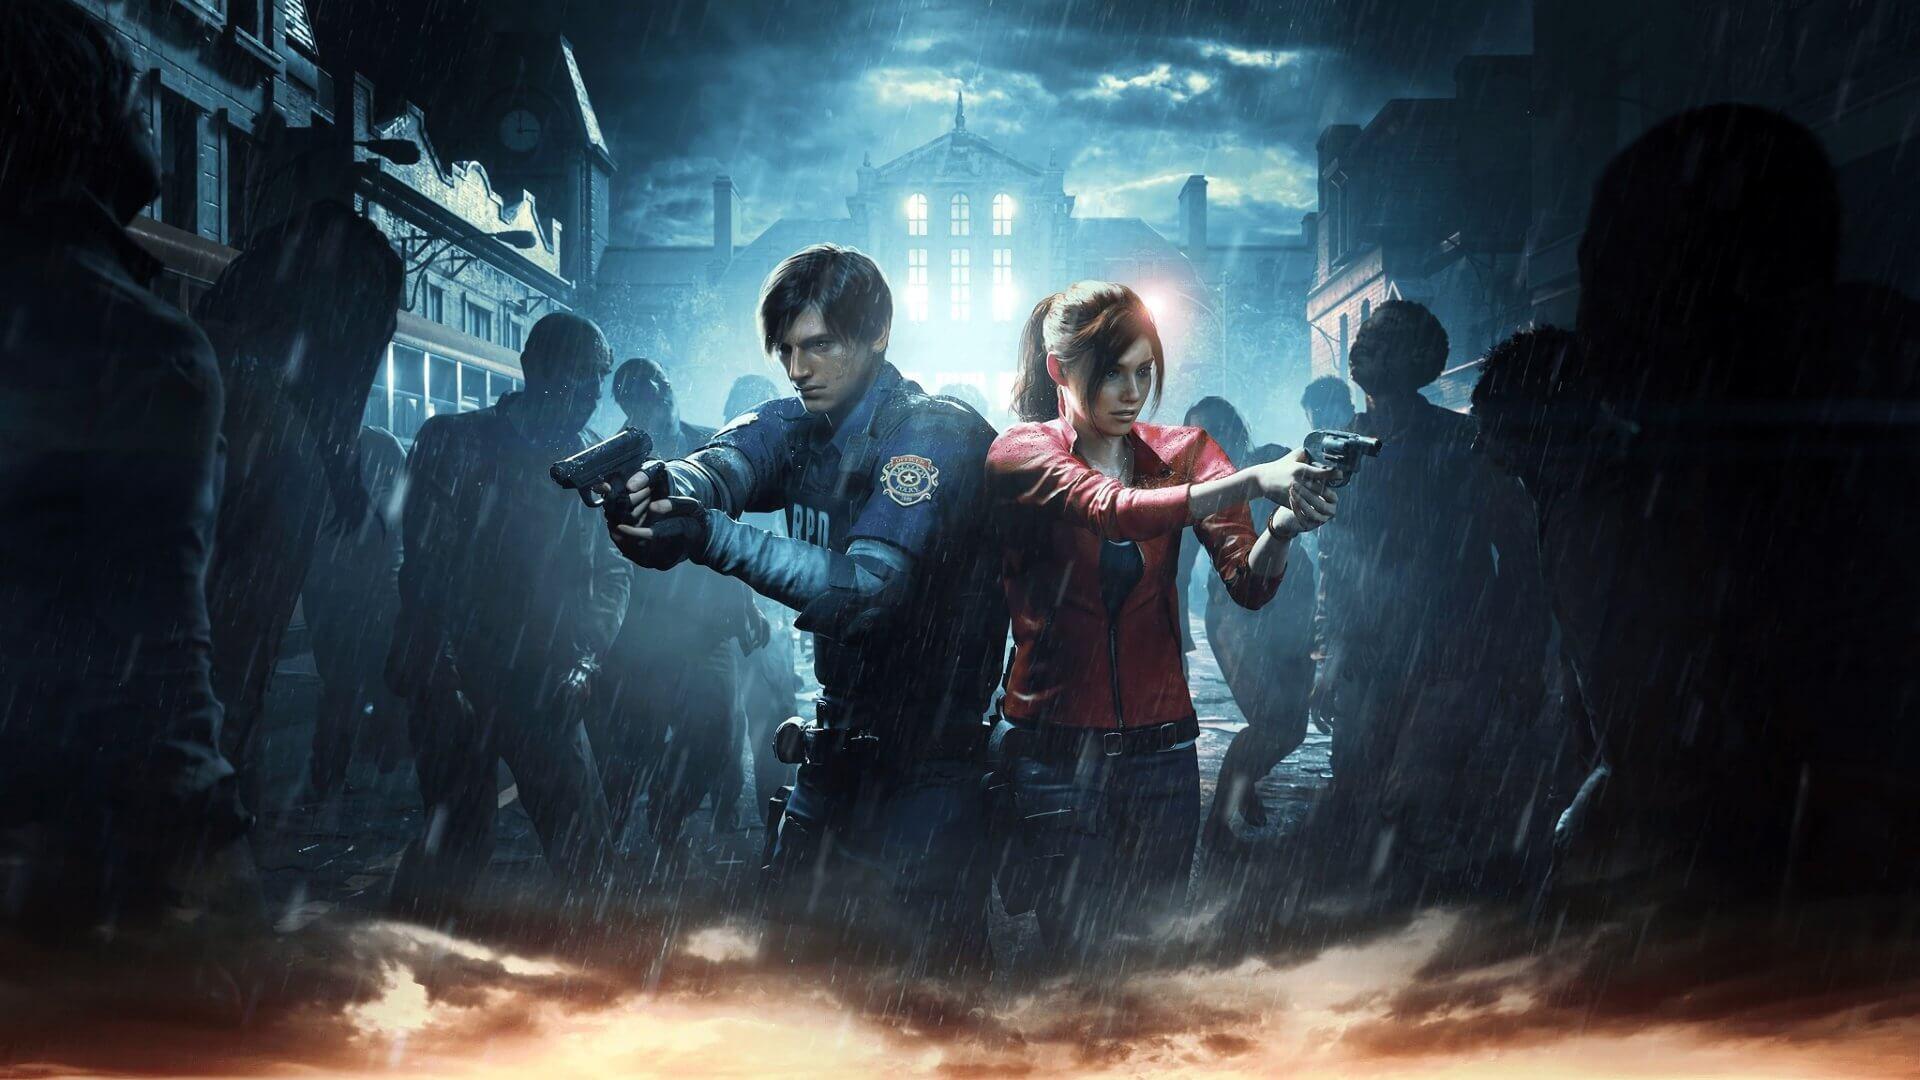 Resident Evil 2 Remake has sold 6.5 million copies, Resident Evil 3 Remake 2.5 million, Monster Hunter World over 15.5 million